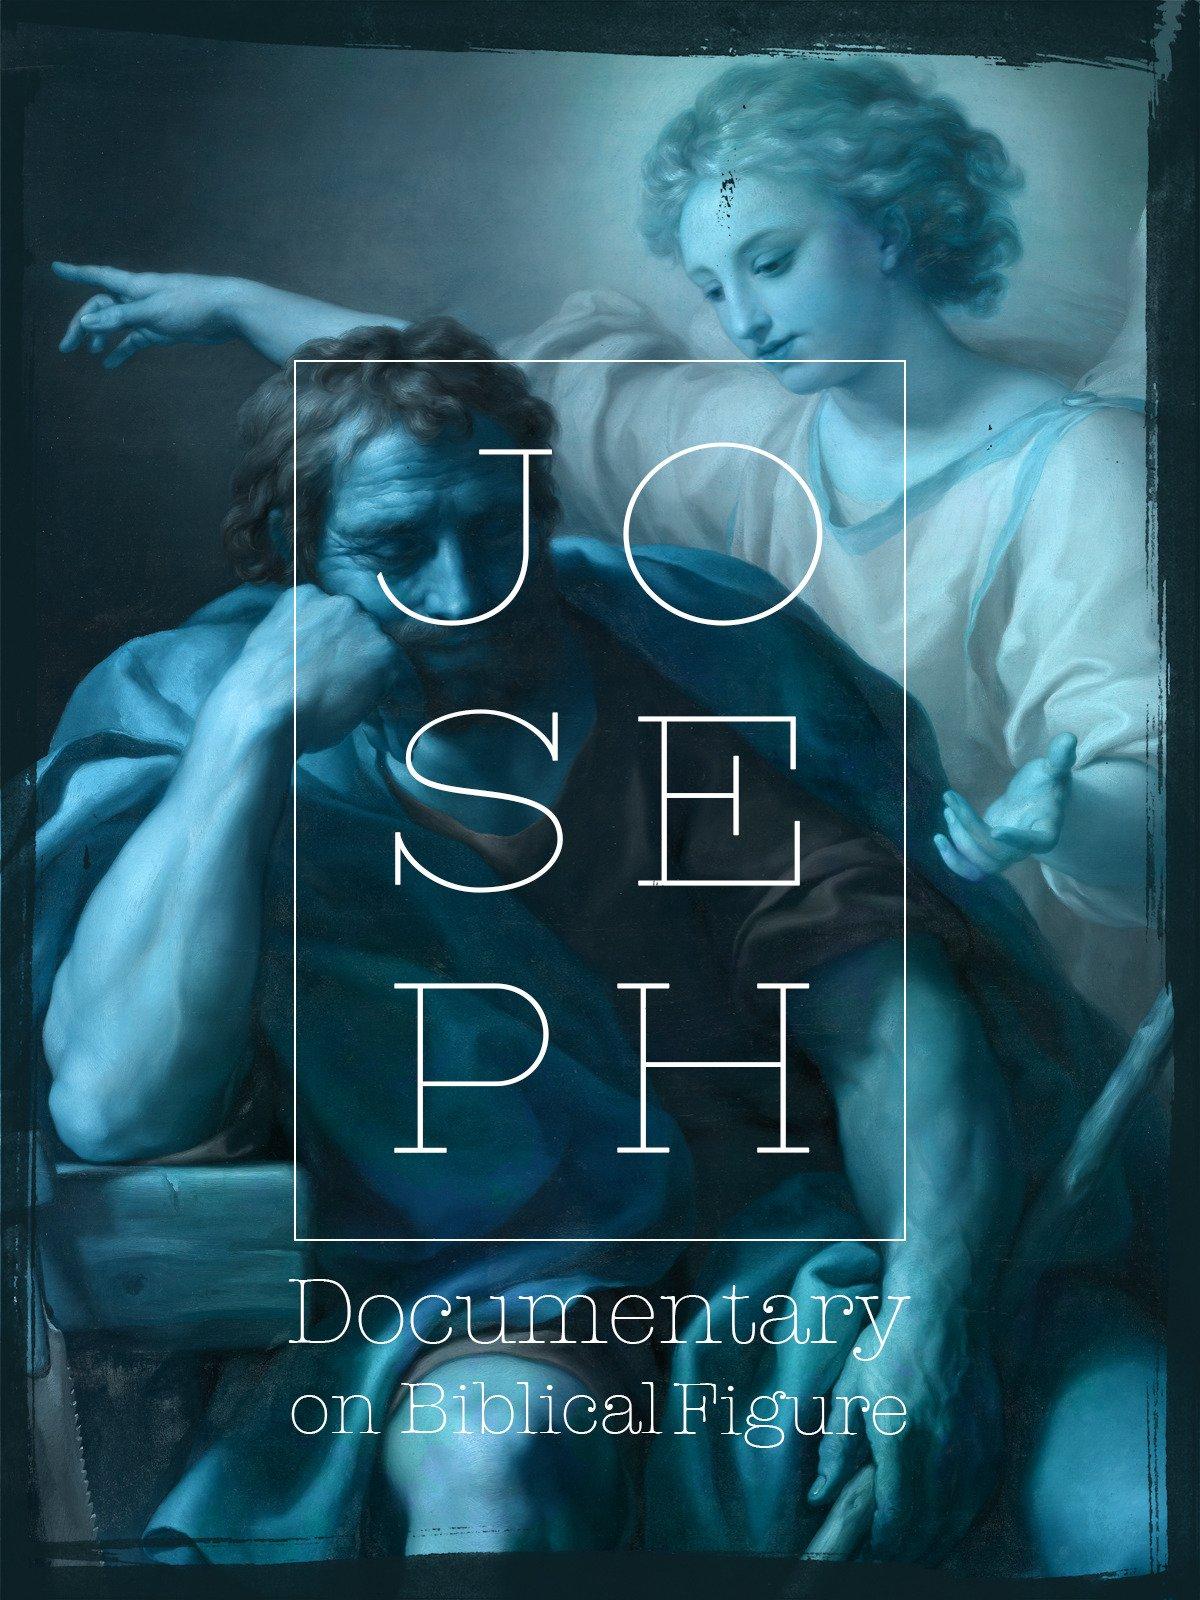 Joseph Documentary on Biblical Figure